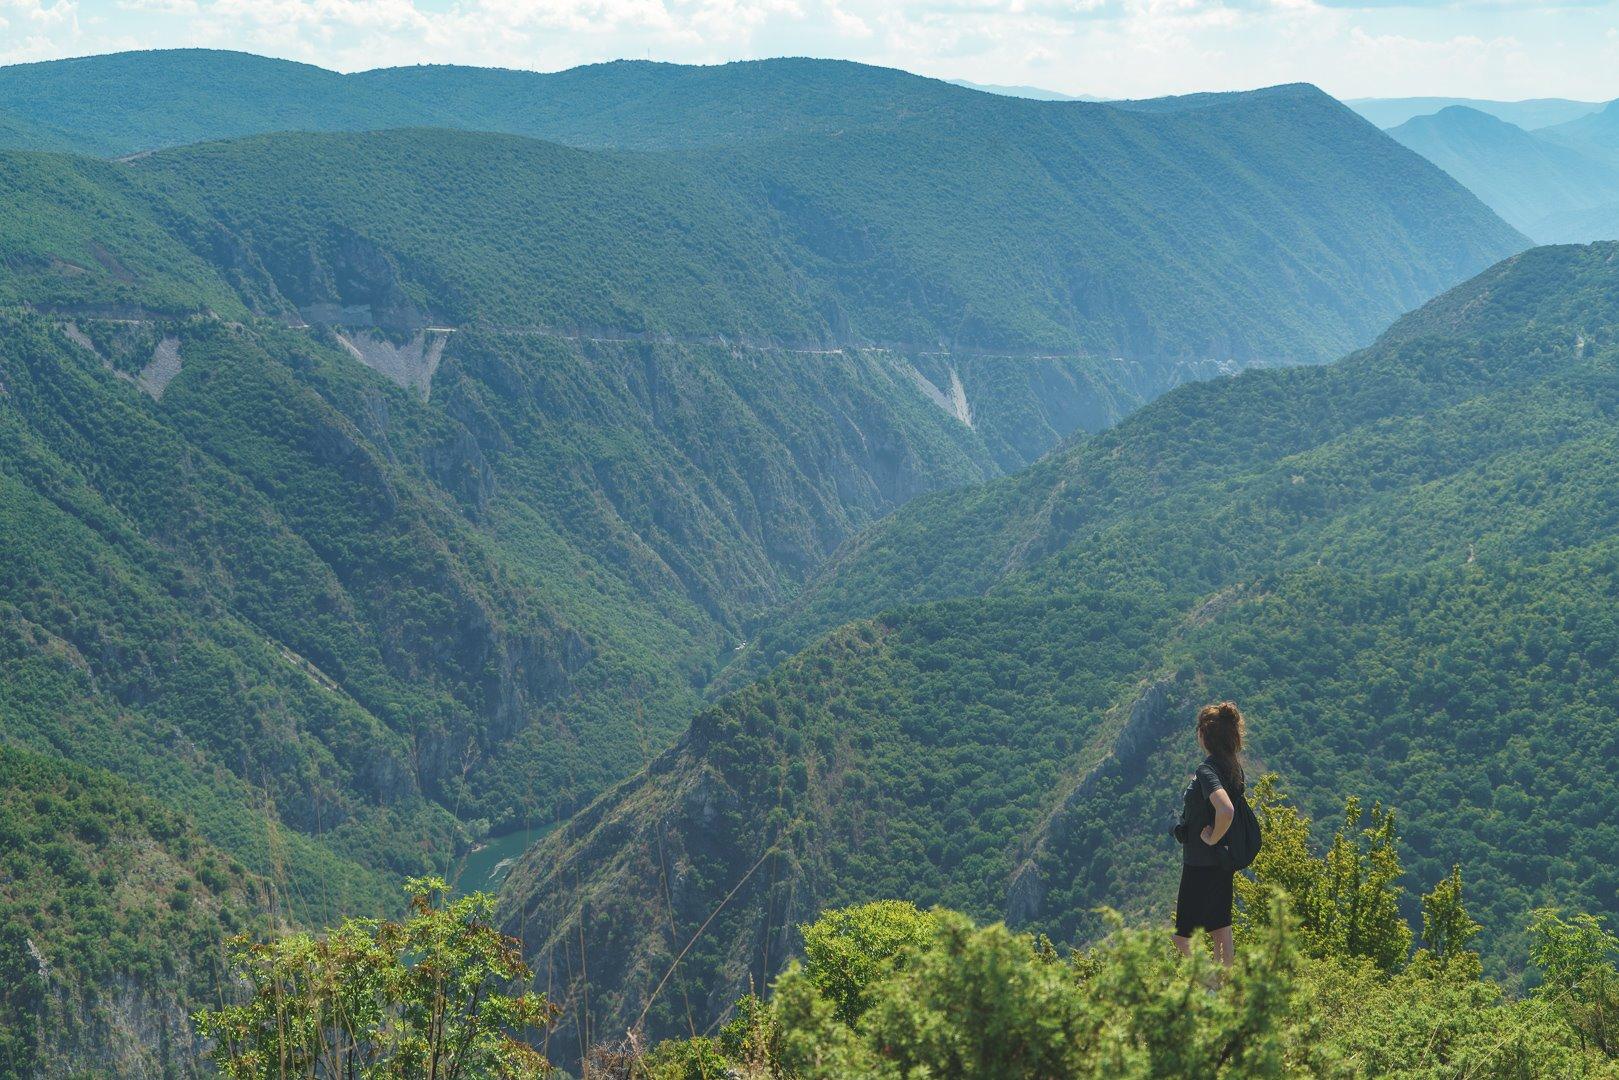 Polish artist Agnieszka Rowińska looking down at Canyon Matka on the 30km Vodno-Matka traverse in Macedonia (FYROM)